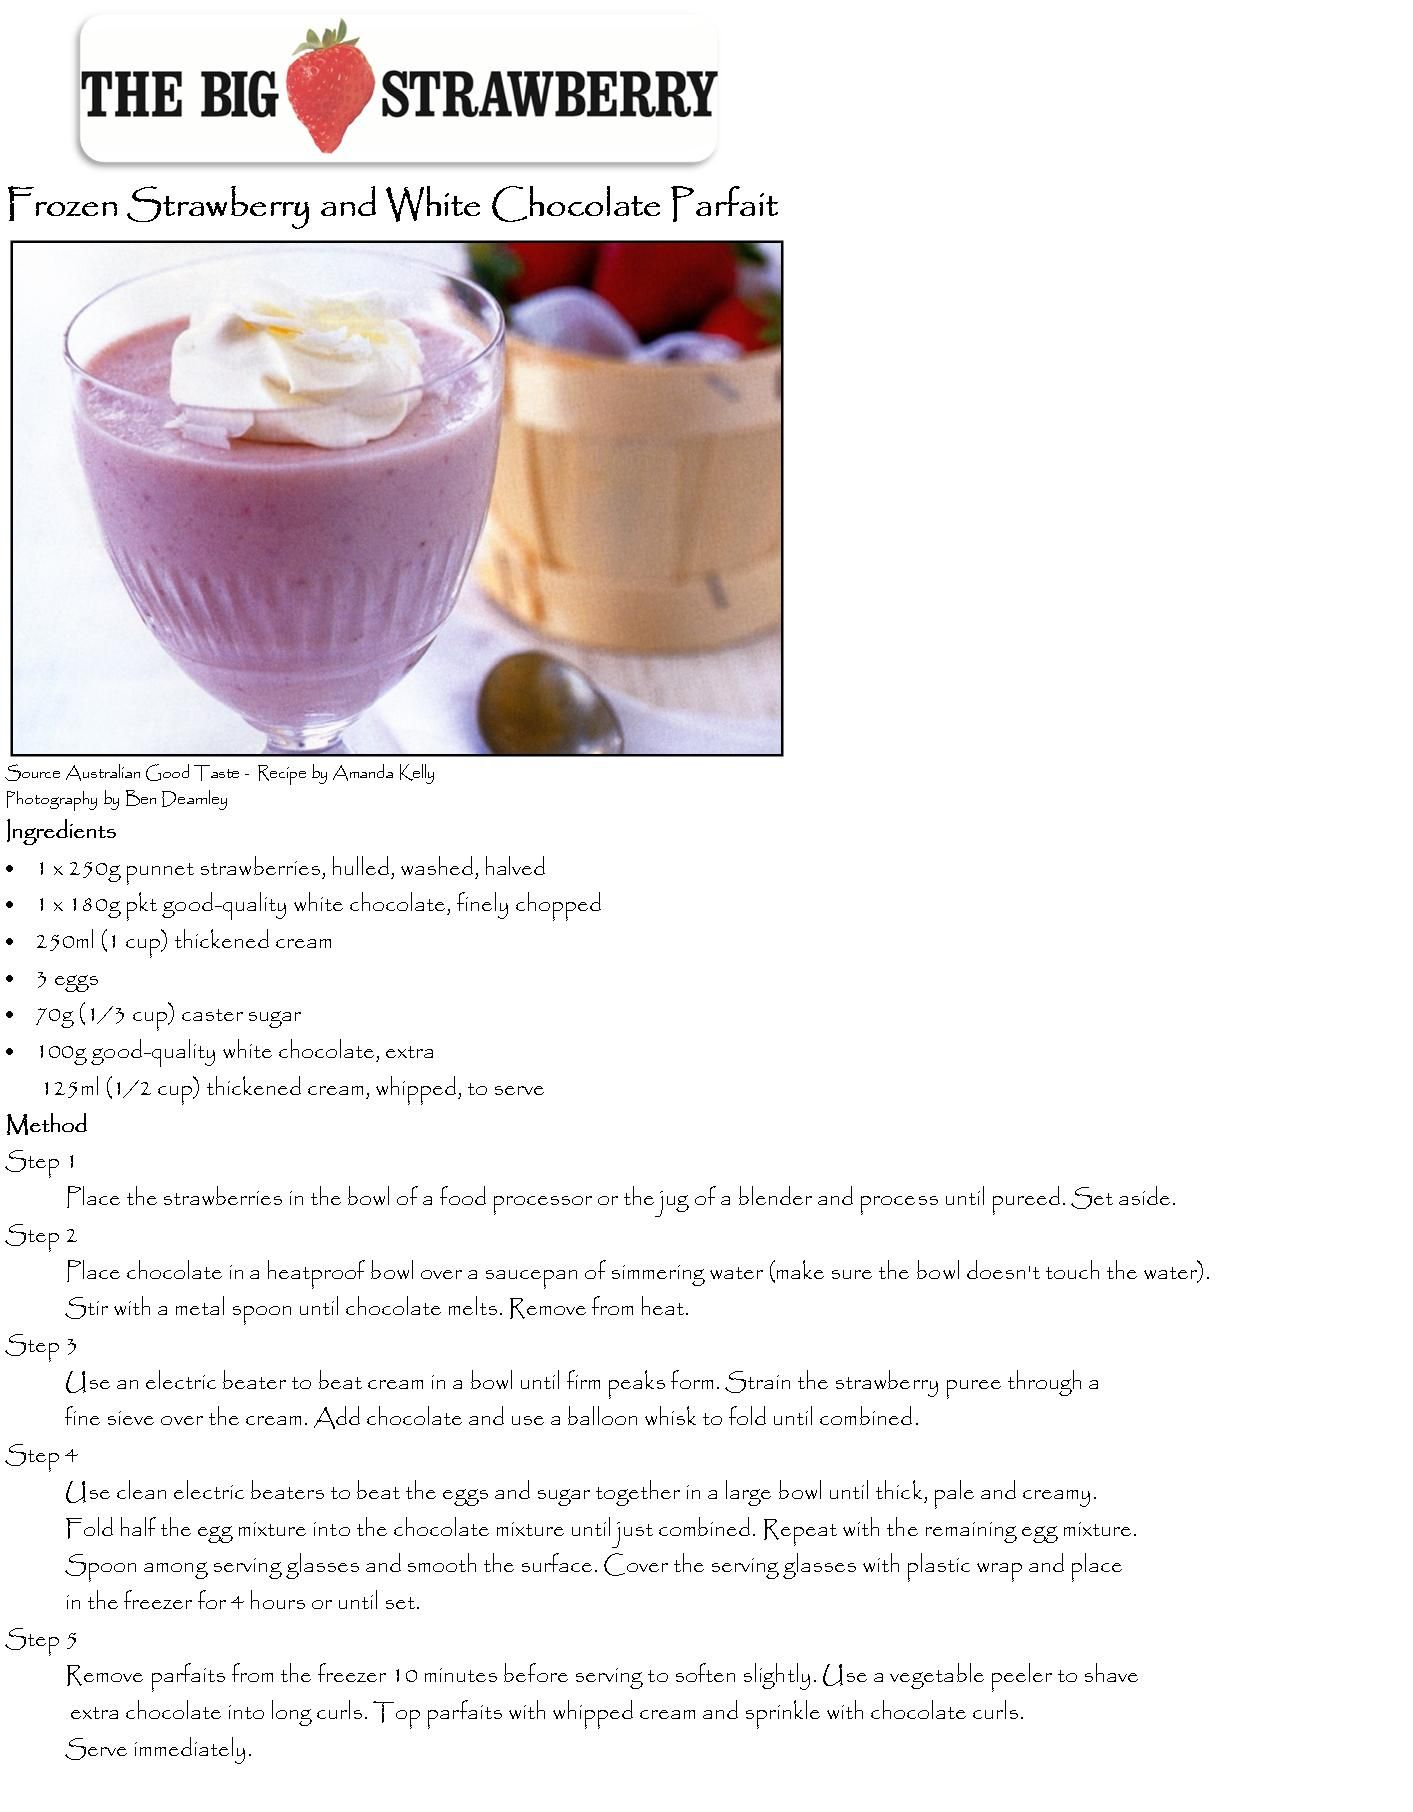 Frozen Strawberry + White Chocolate Parfait